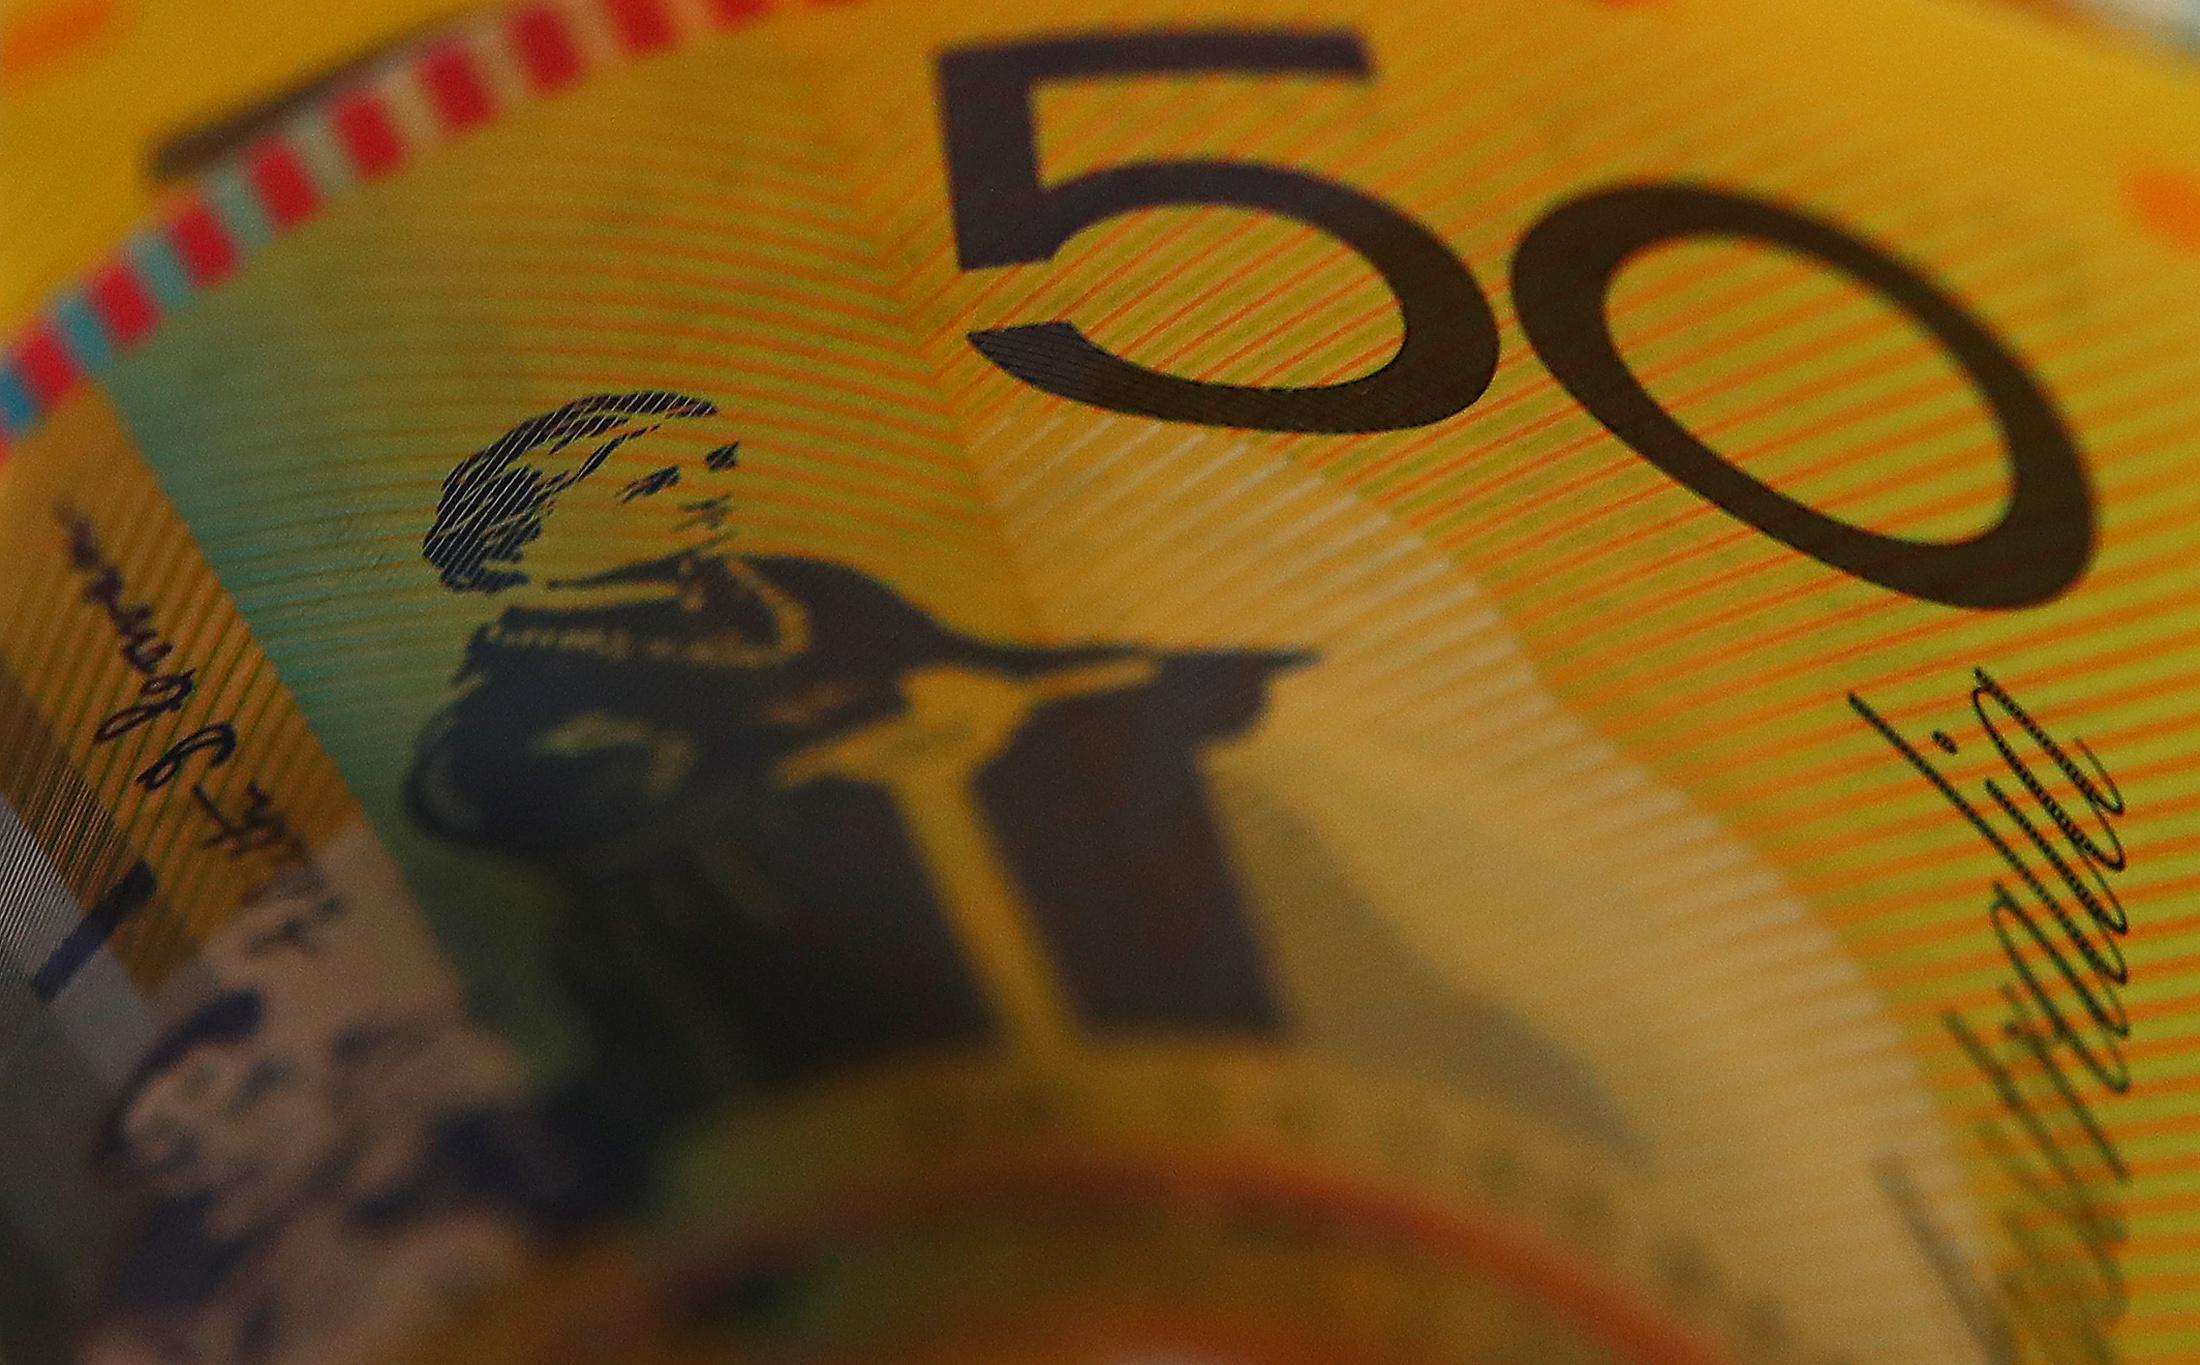 Australian dollars are seen in an illustration photo February 8, 2018. REUTERS/Daniel Munoz